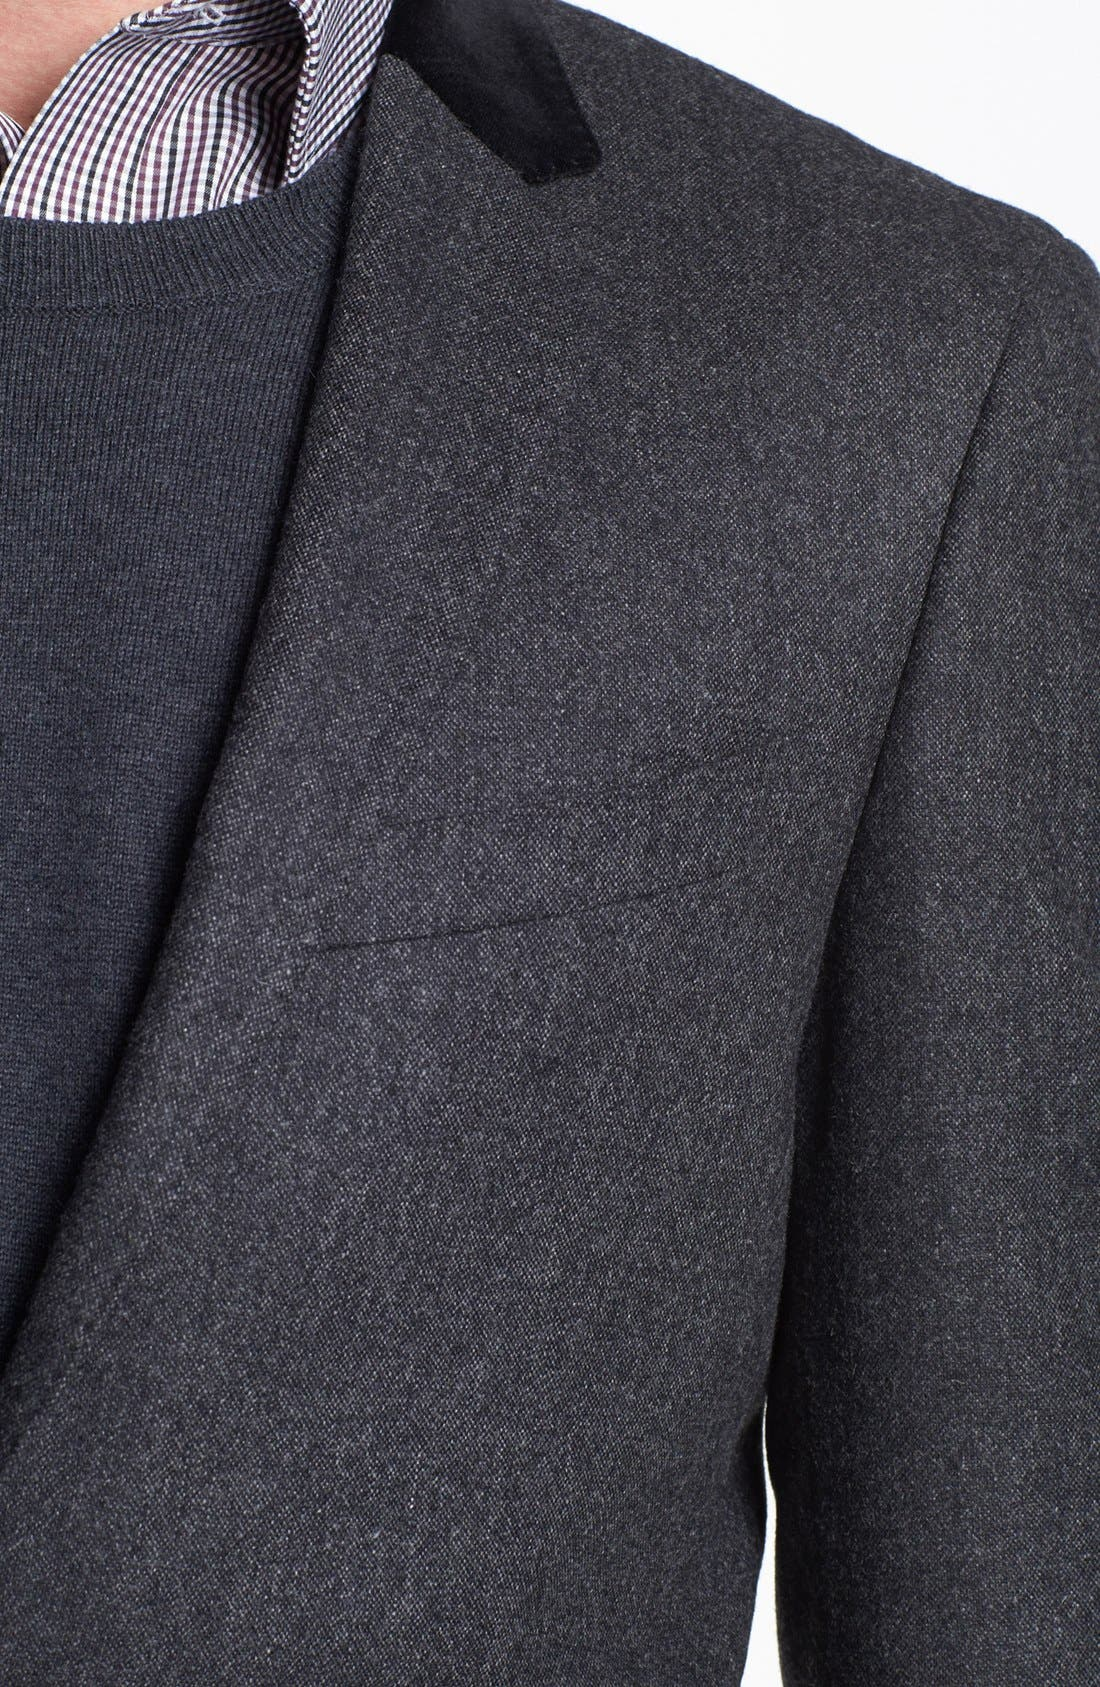 Alternate Image 2  - BOSS HUGO BOSS 'Rayford' Trim Fit Blazer